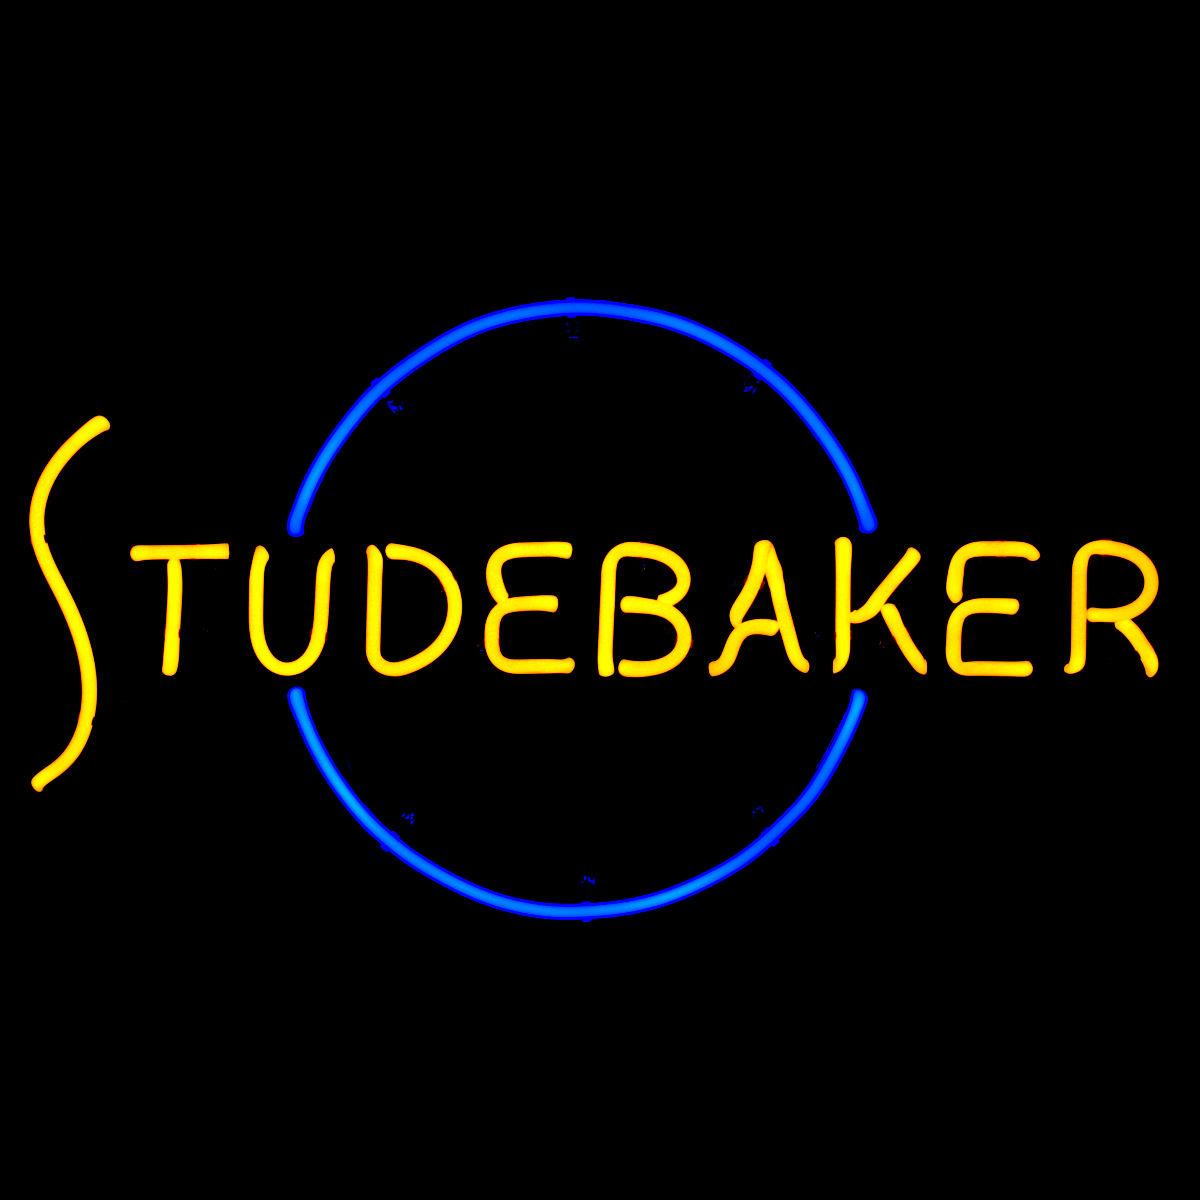 Studebaker Dealership Neon Signs by John Barton - former Studebaker Packard New Car Dealer - BartonNeonMagic.com